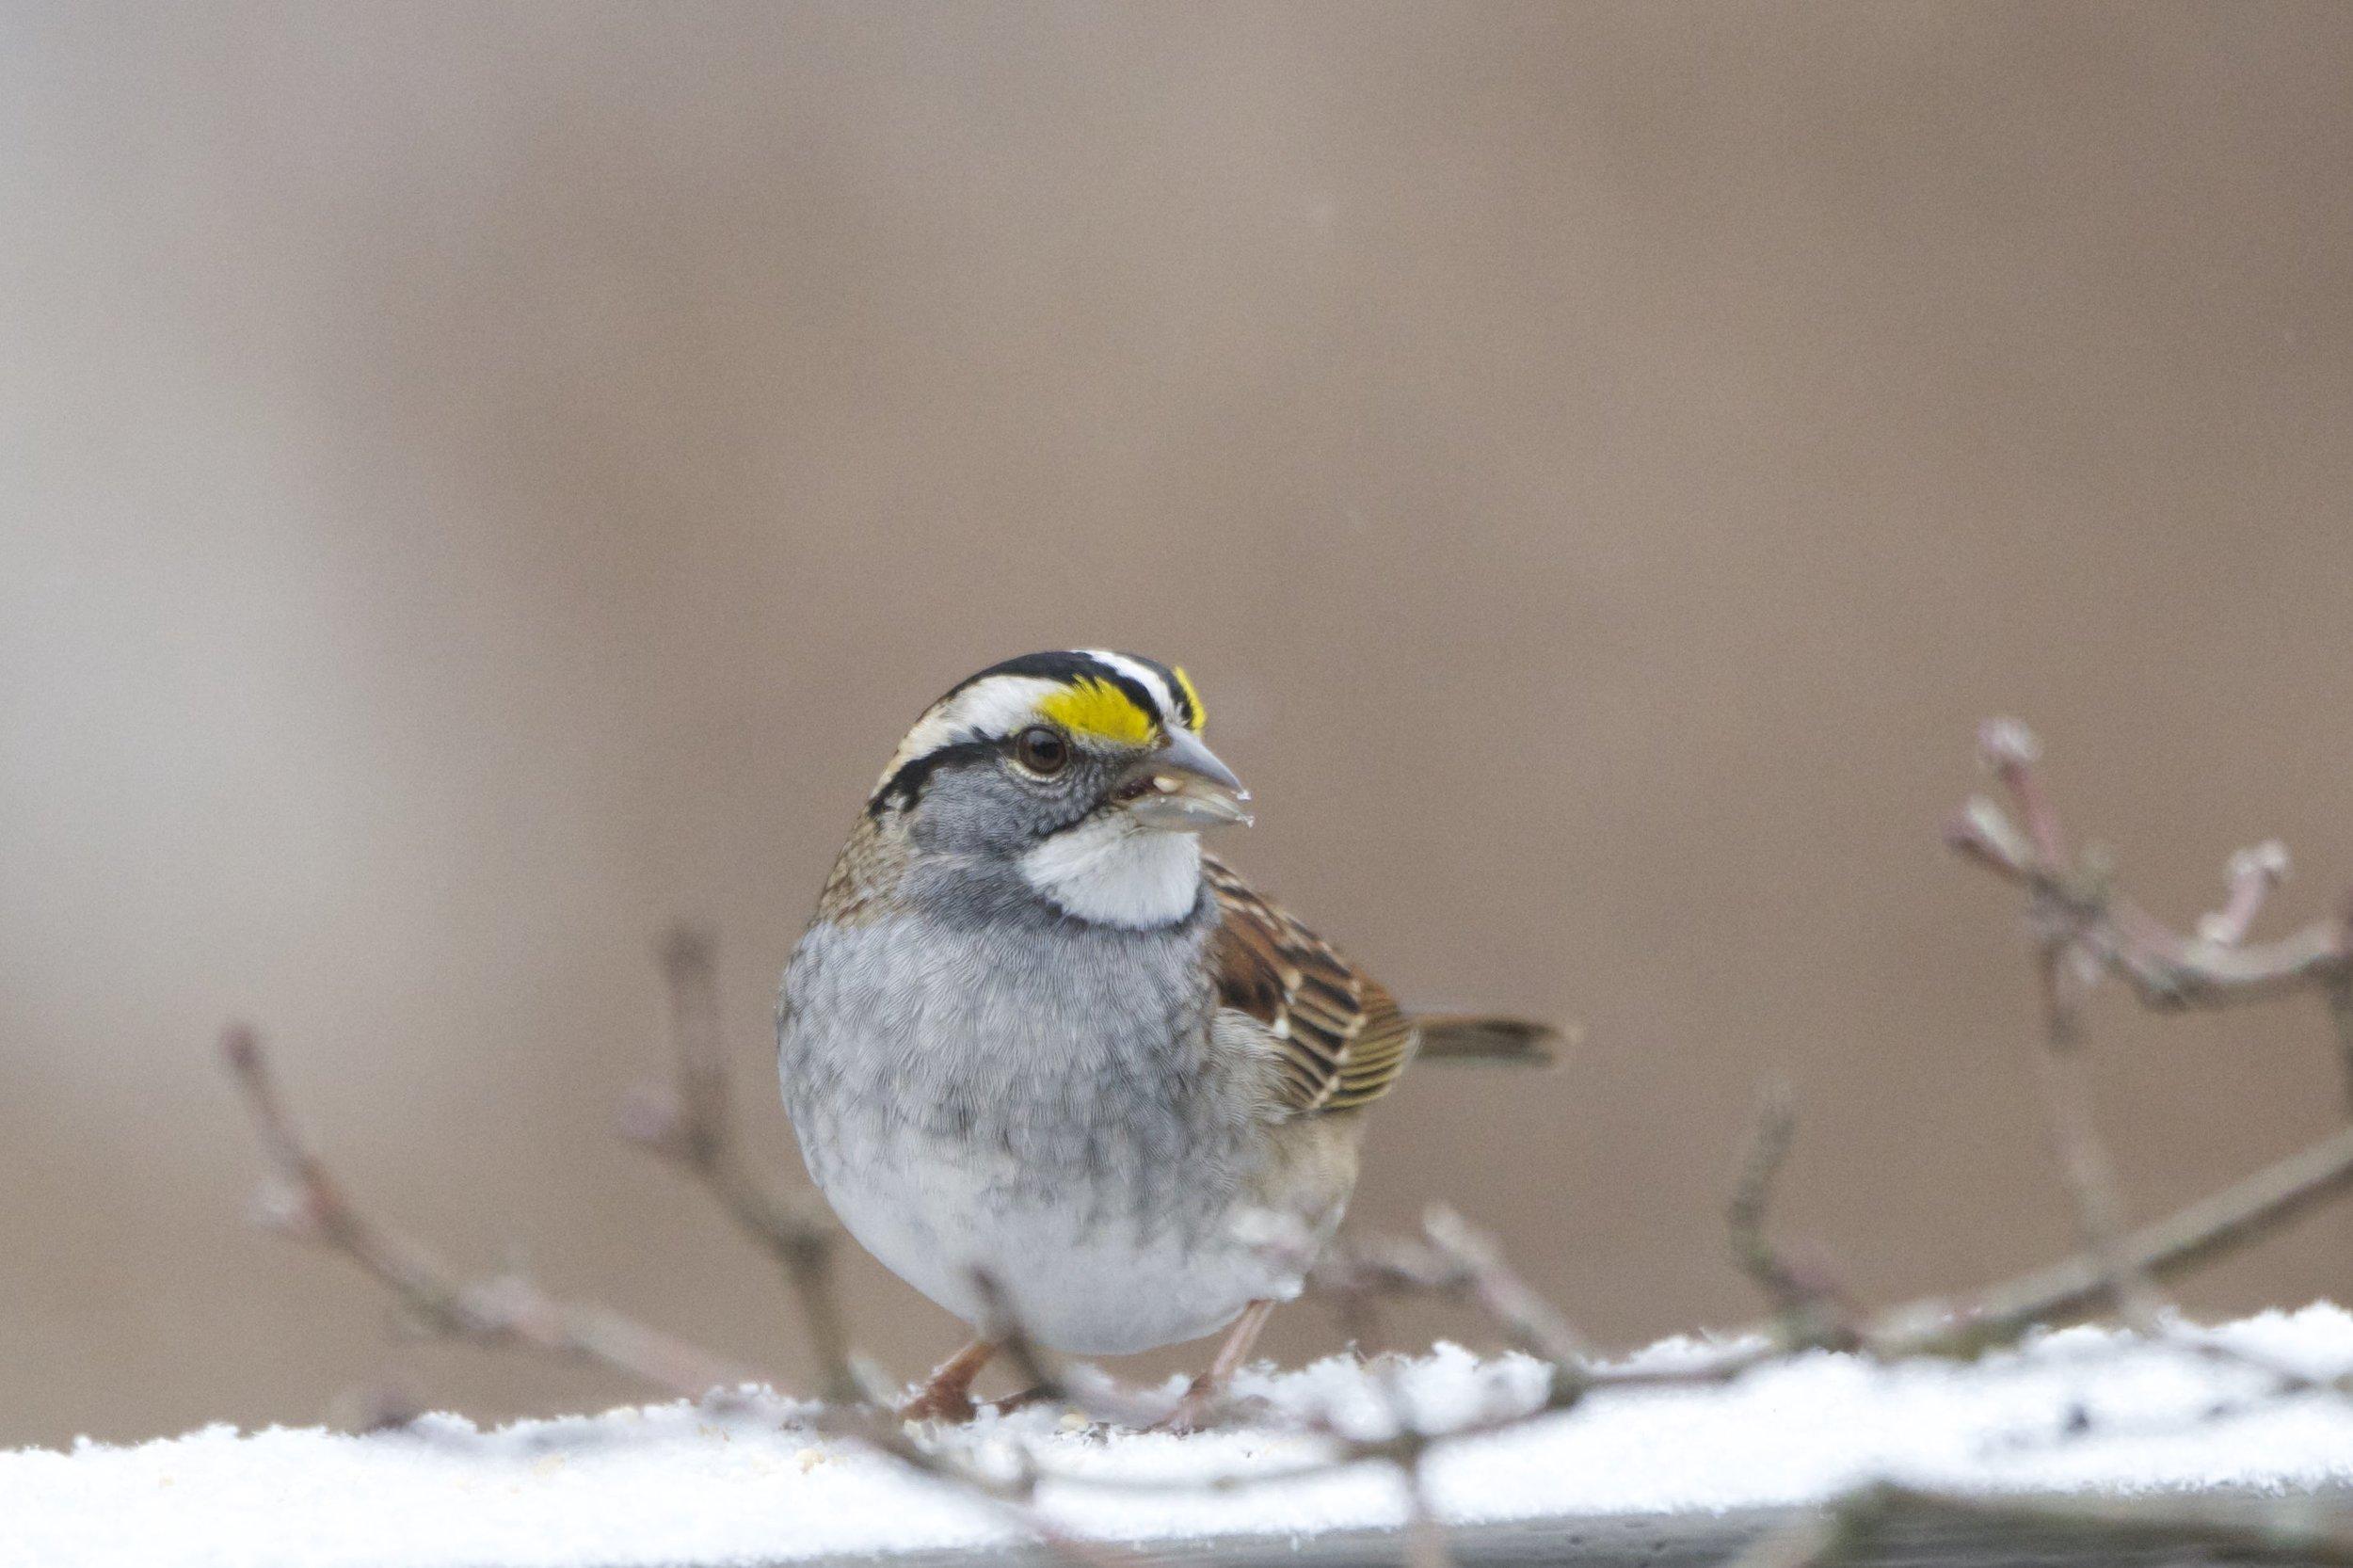 White-throated Sparrow 1 - Version 2.jpg